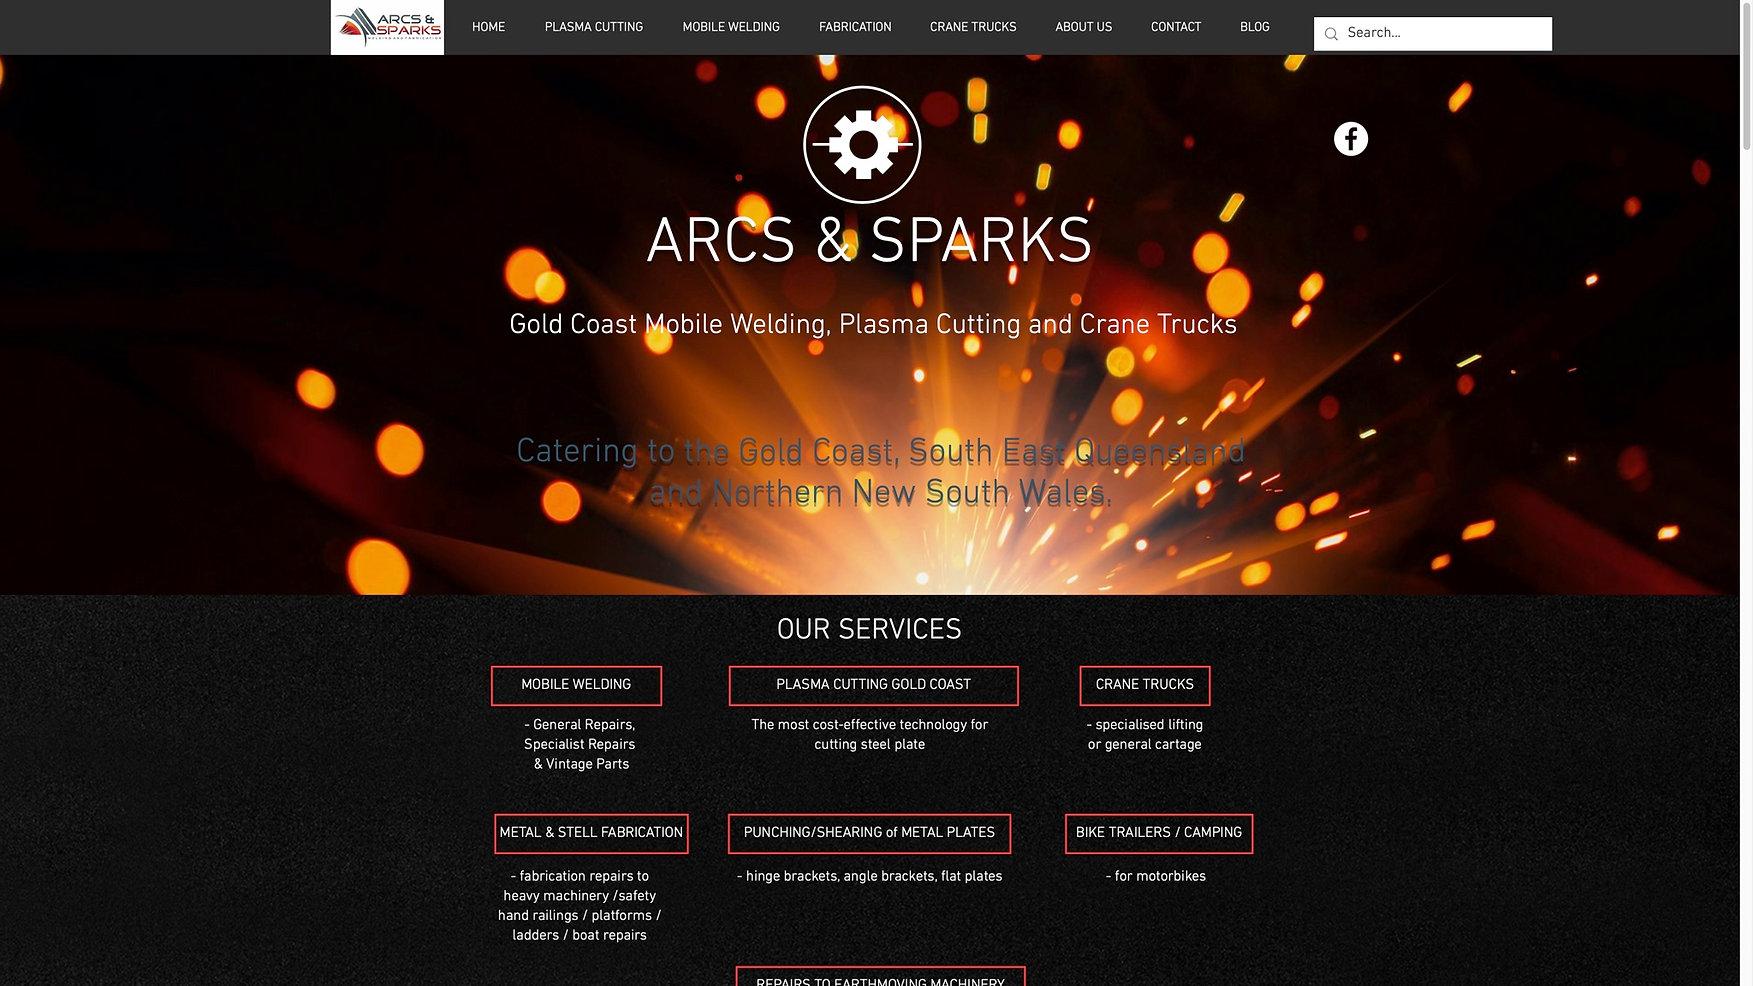 ARCS & SPARKS website.jpeg